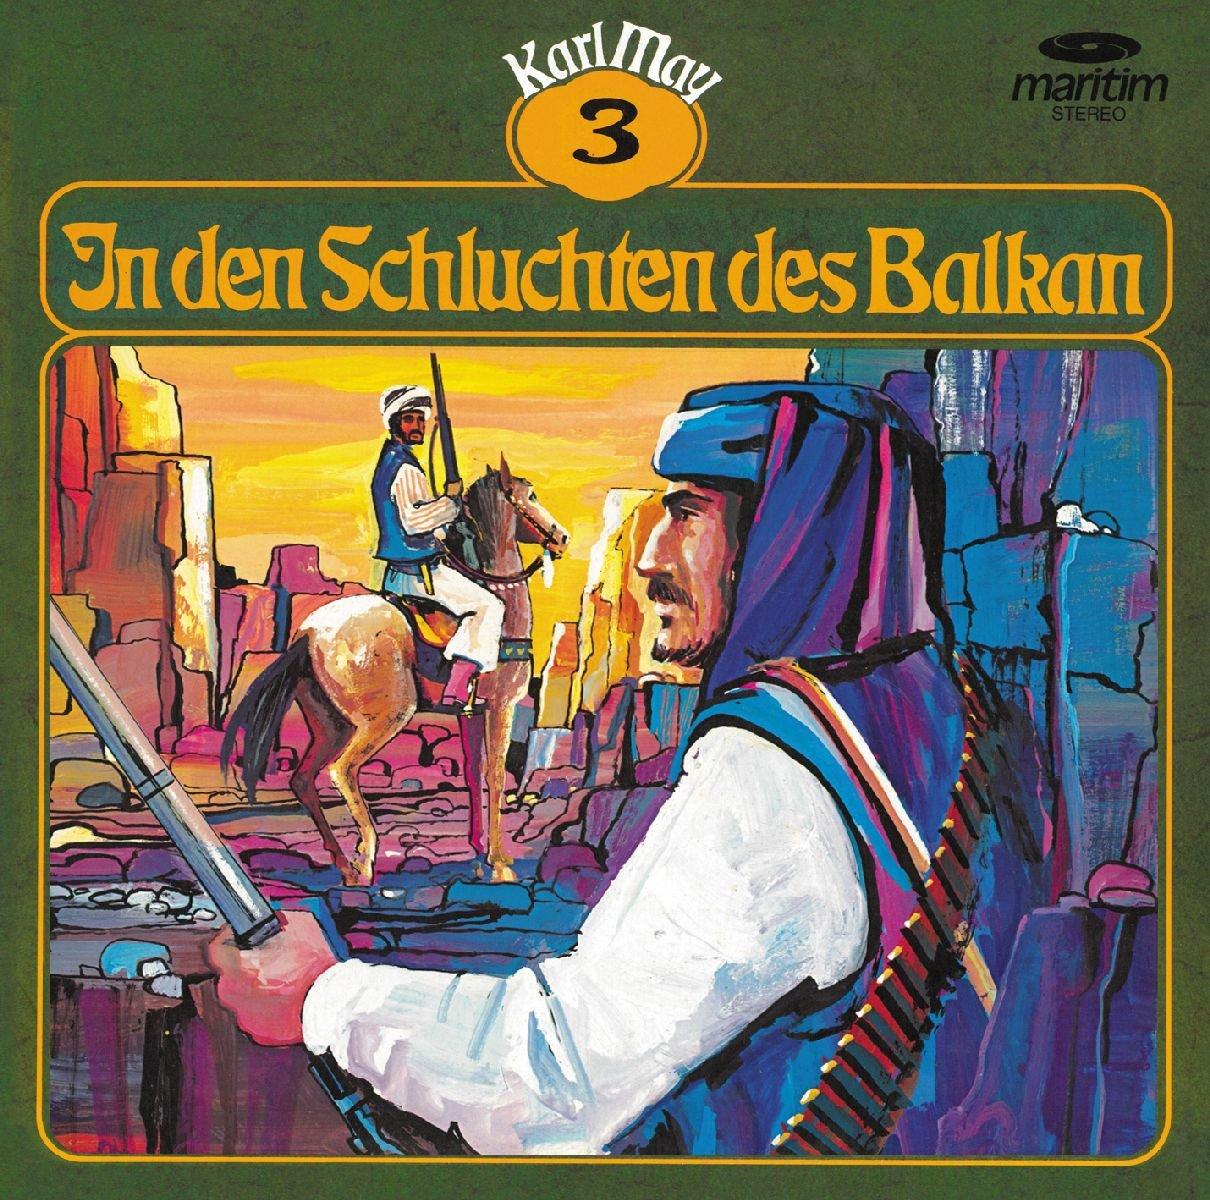 Karl May Klassiker (3) In den Schluchten des Balkan - Maritim Produktionen 1975 / 2017